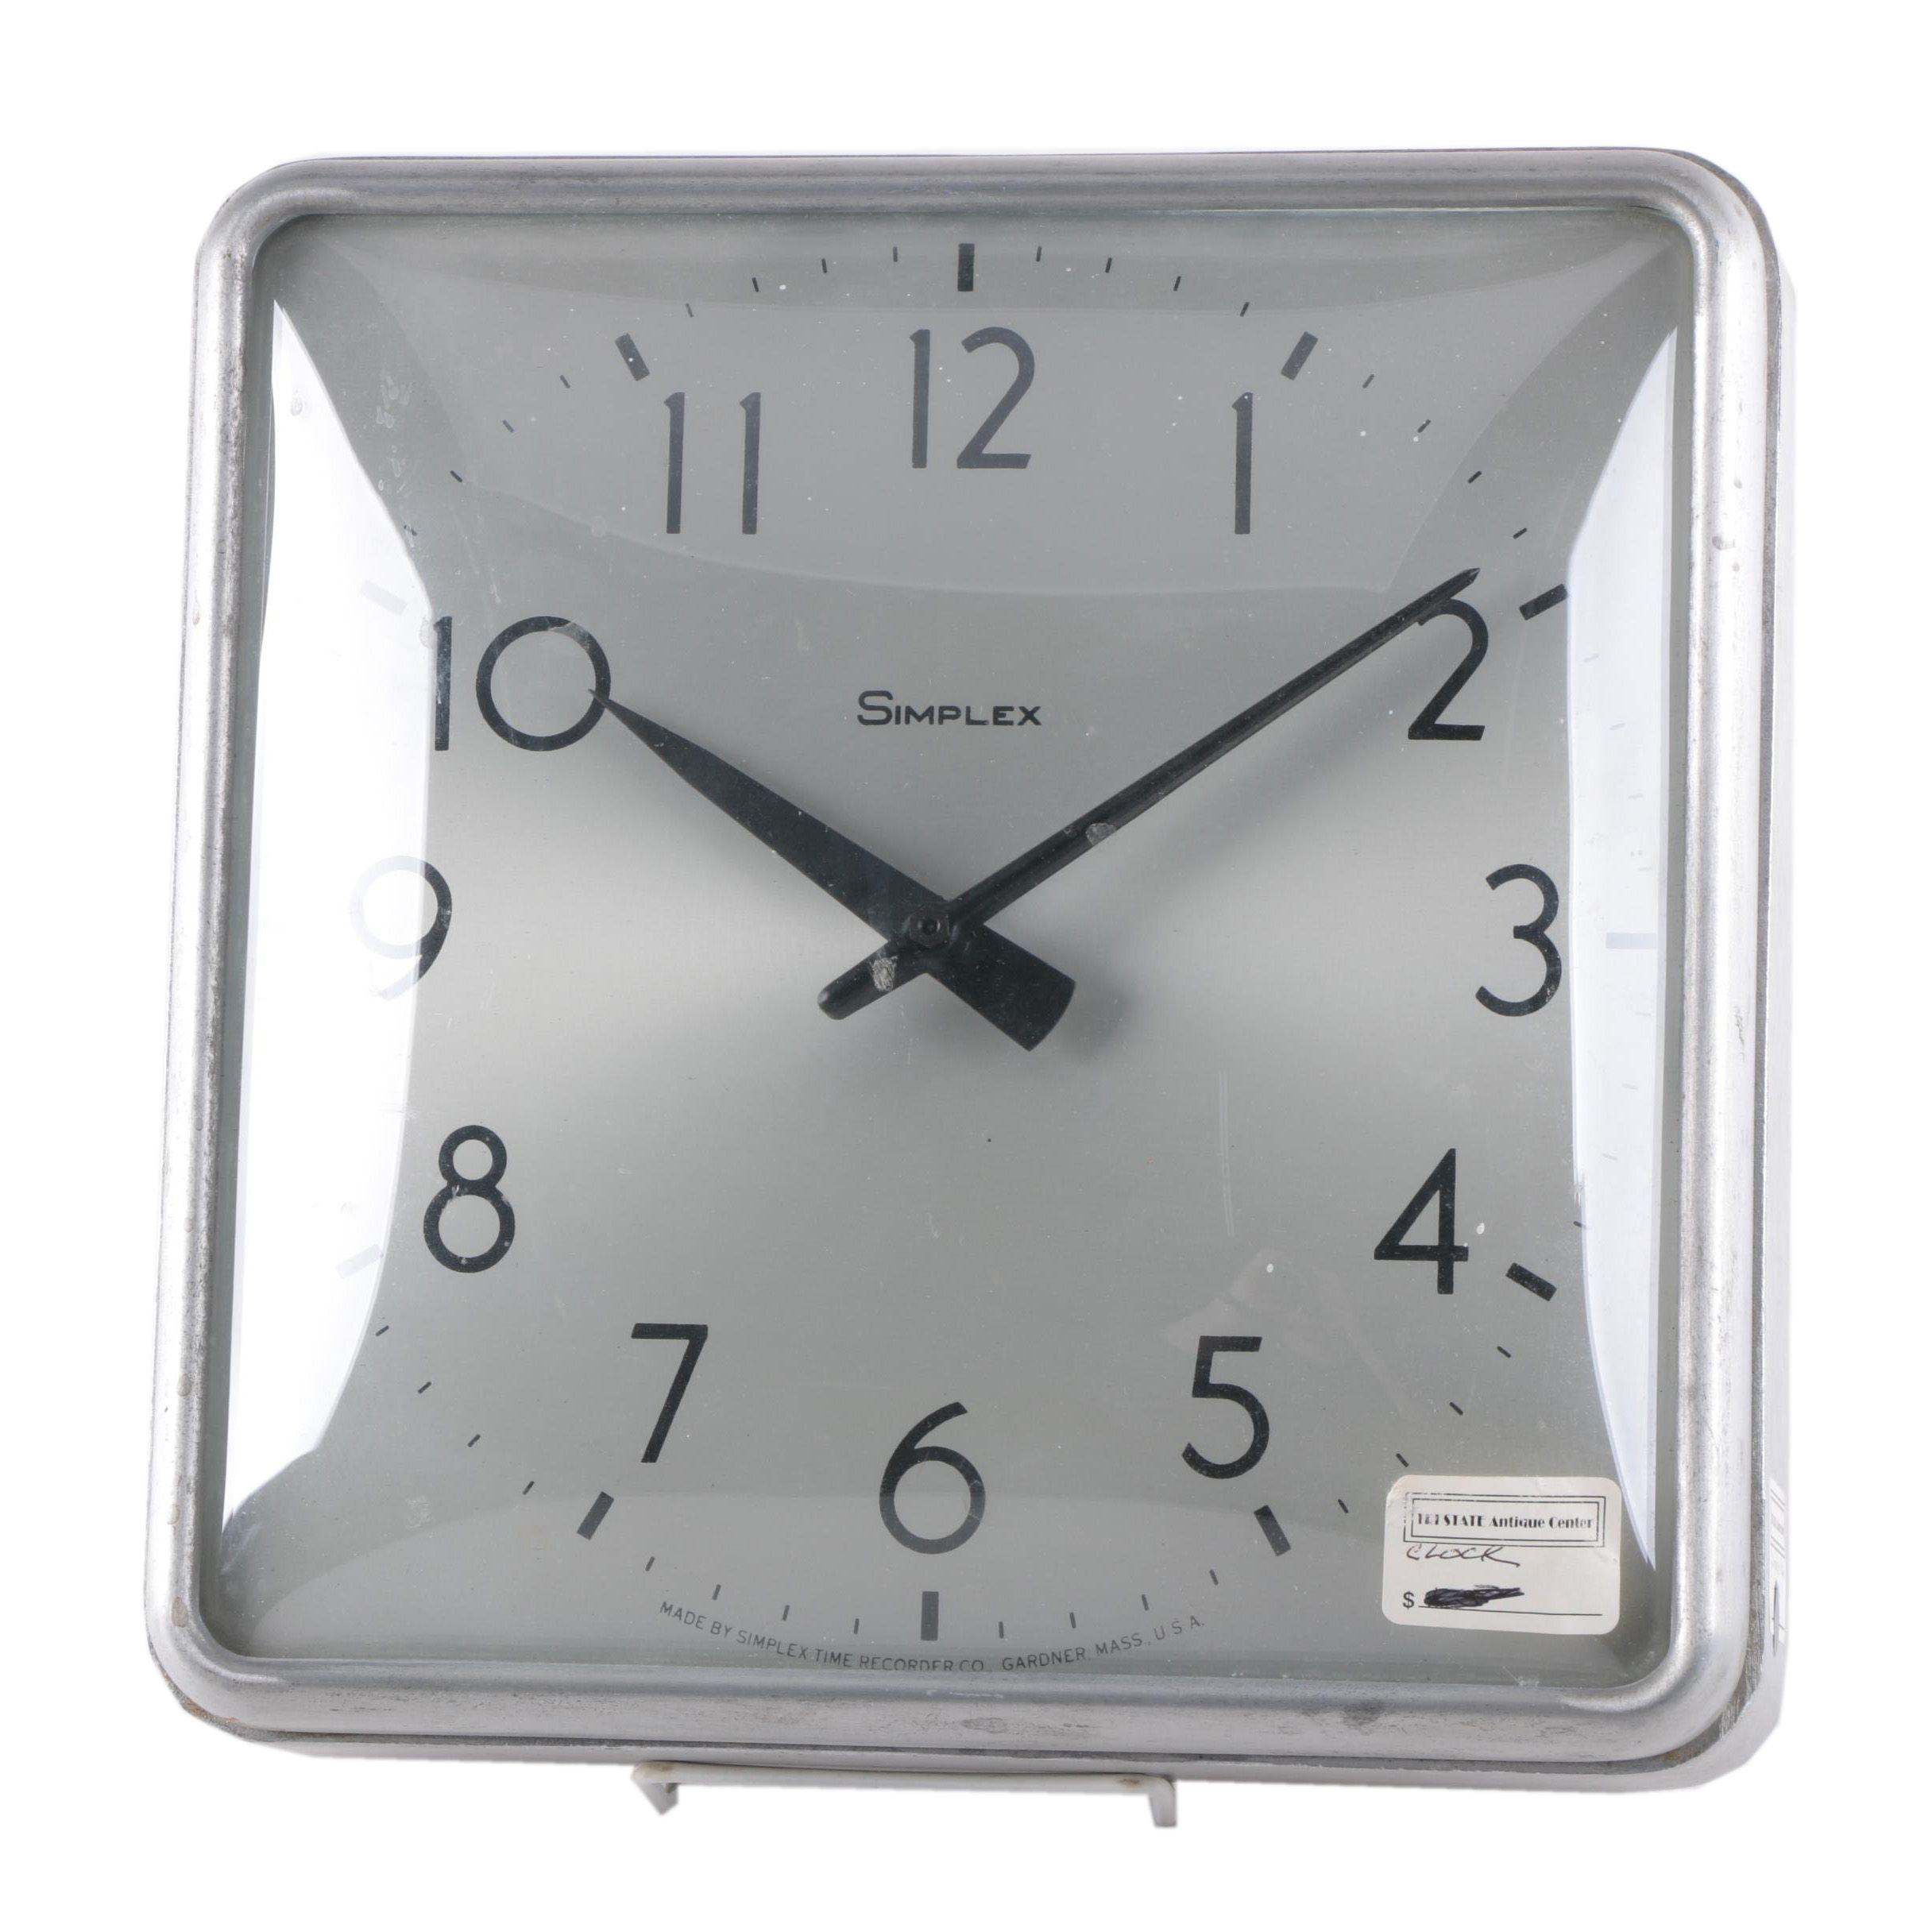 Vintage Simplex Electrical Wall Clock